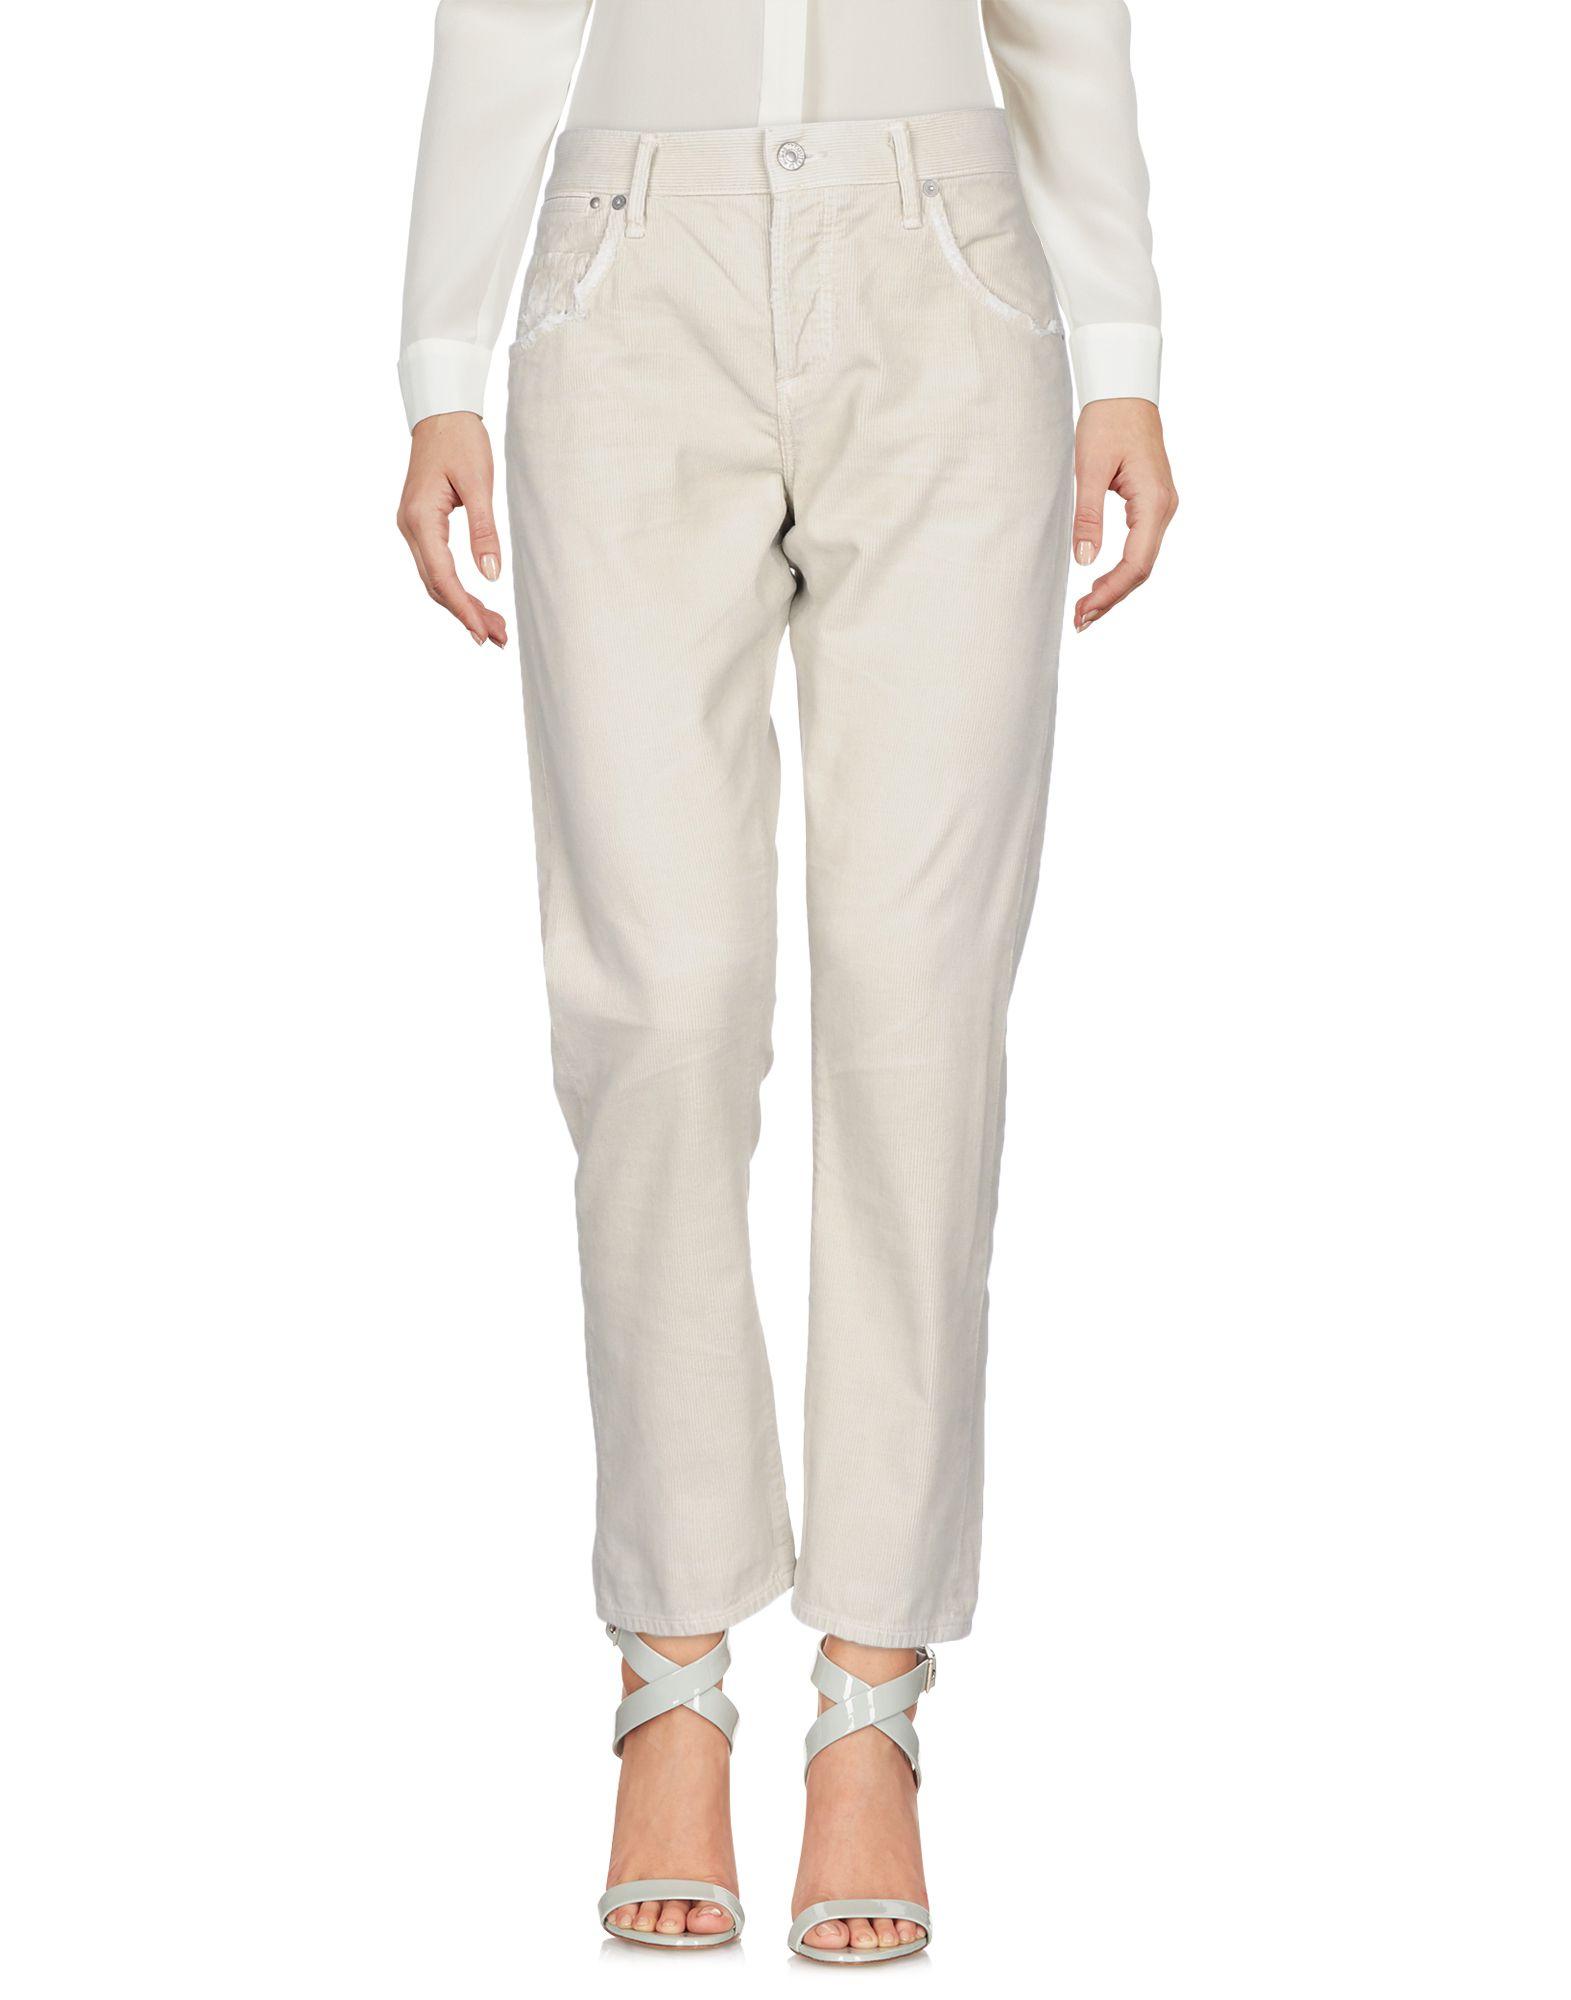 Pantalone Citizens Of Humanity Donna - Acquista online su vFKbJuuftx